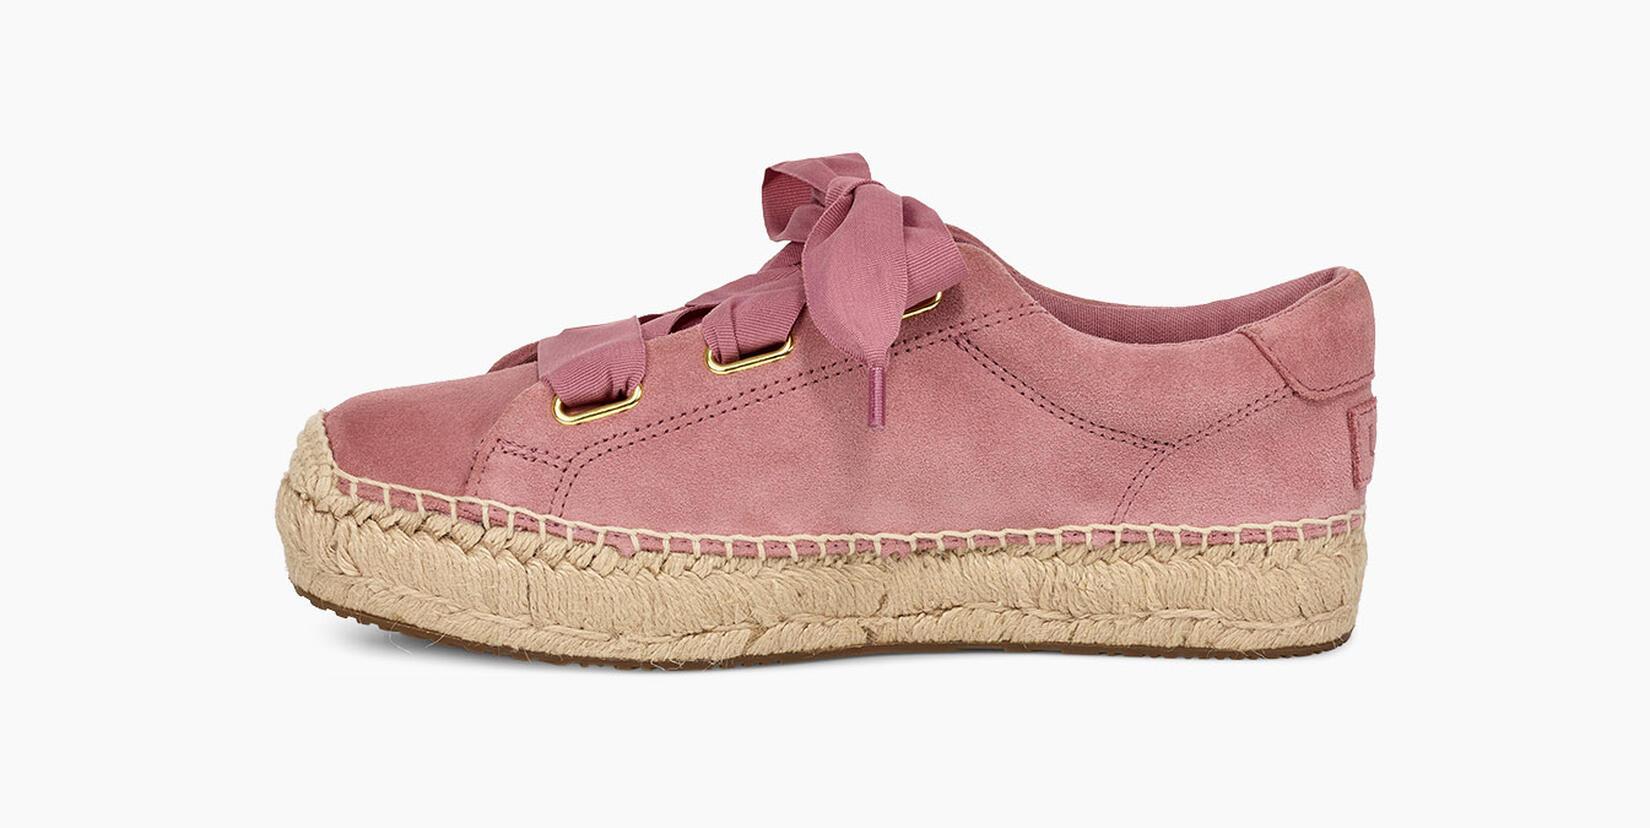 Brianna Sneaker